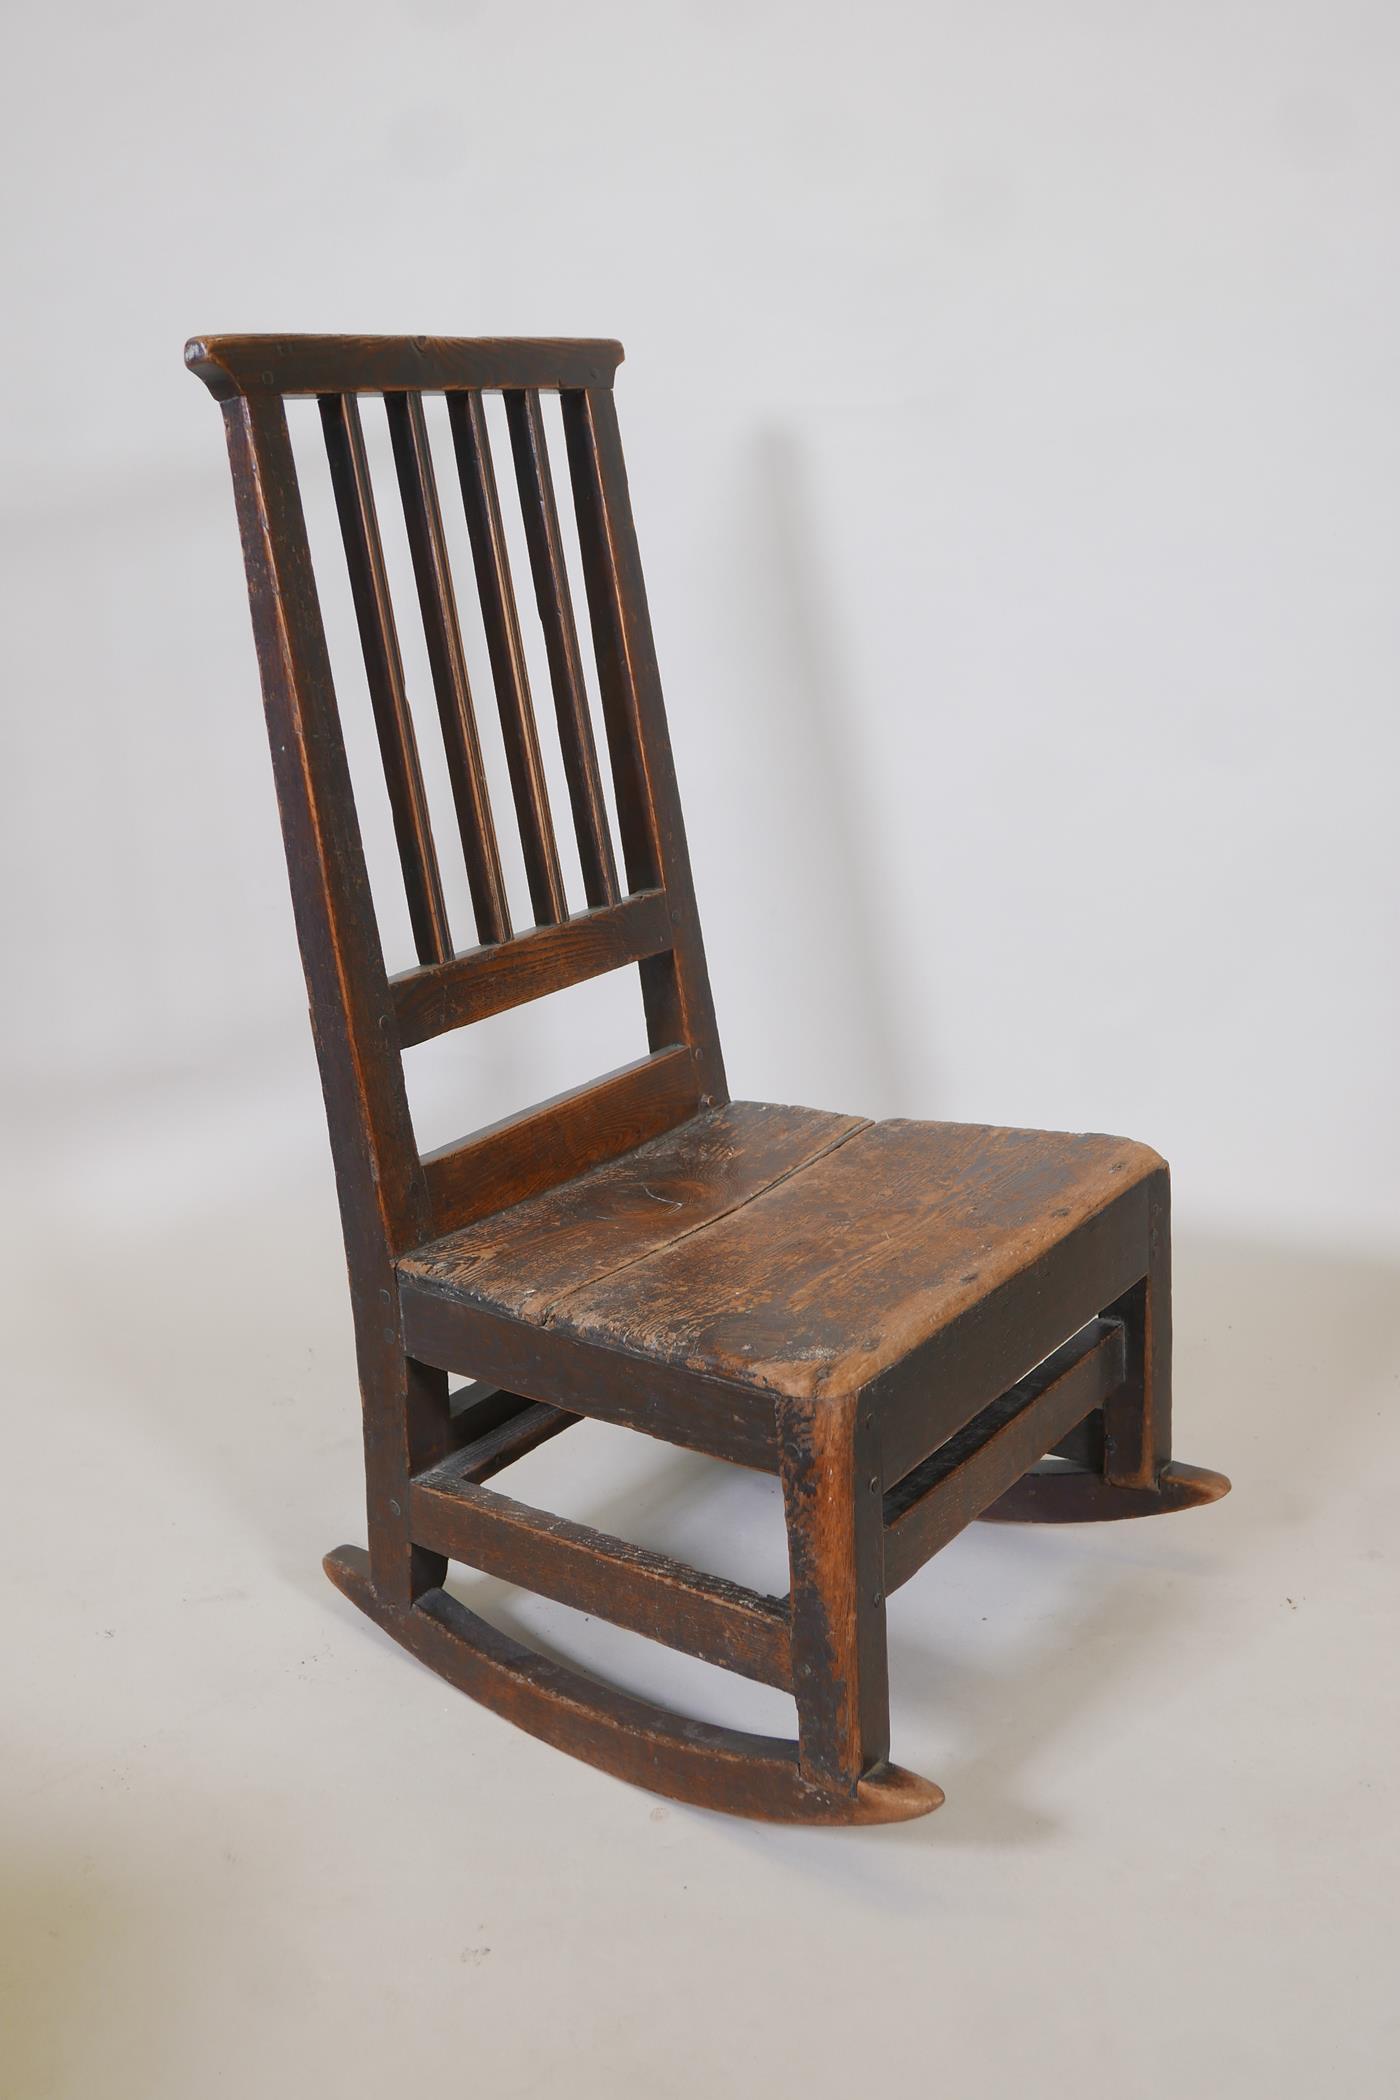 An C18th elm ladderback rocking chair